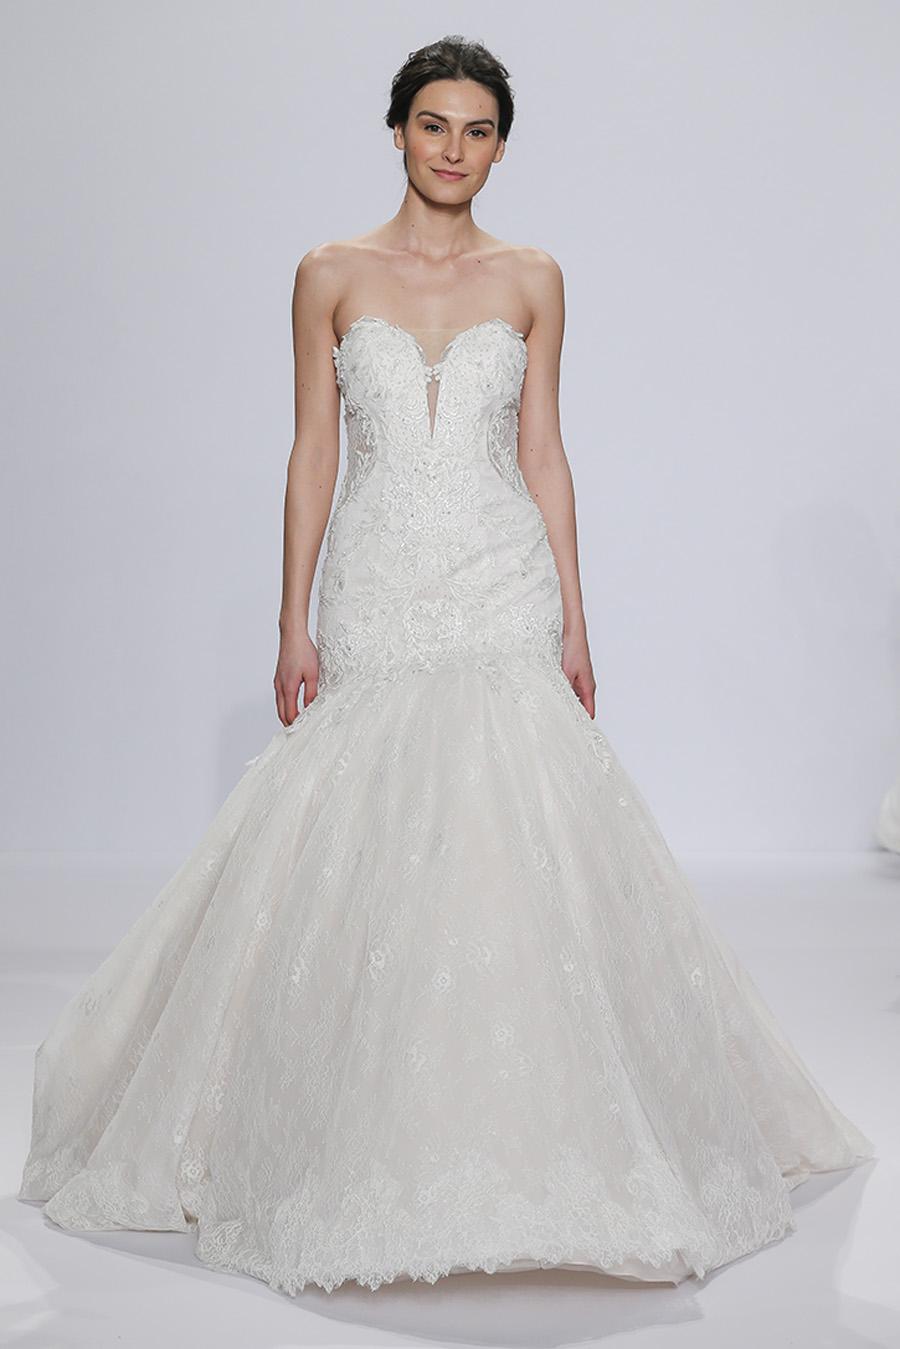 Randy Fenoli Bridal Collection gown 14